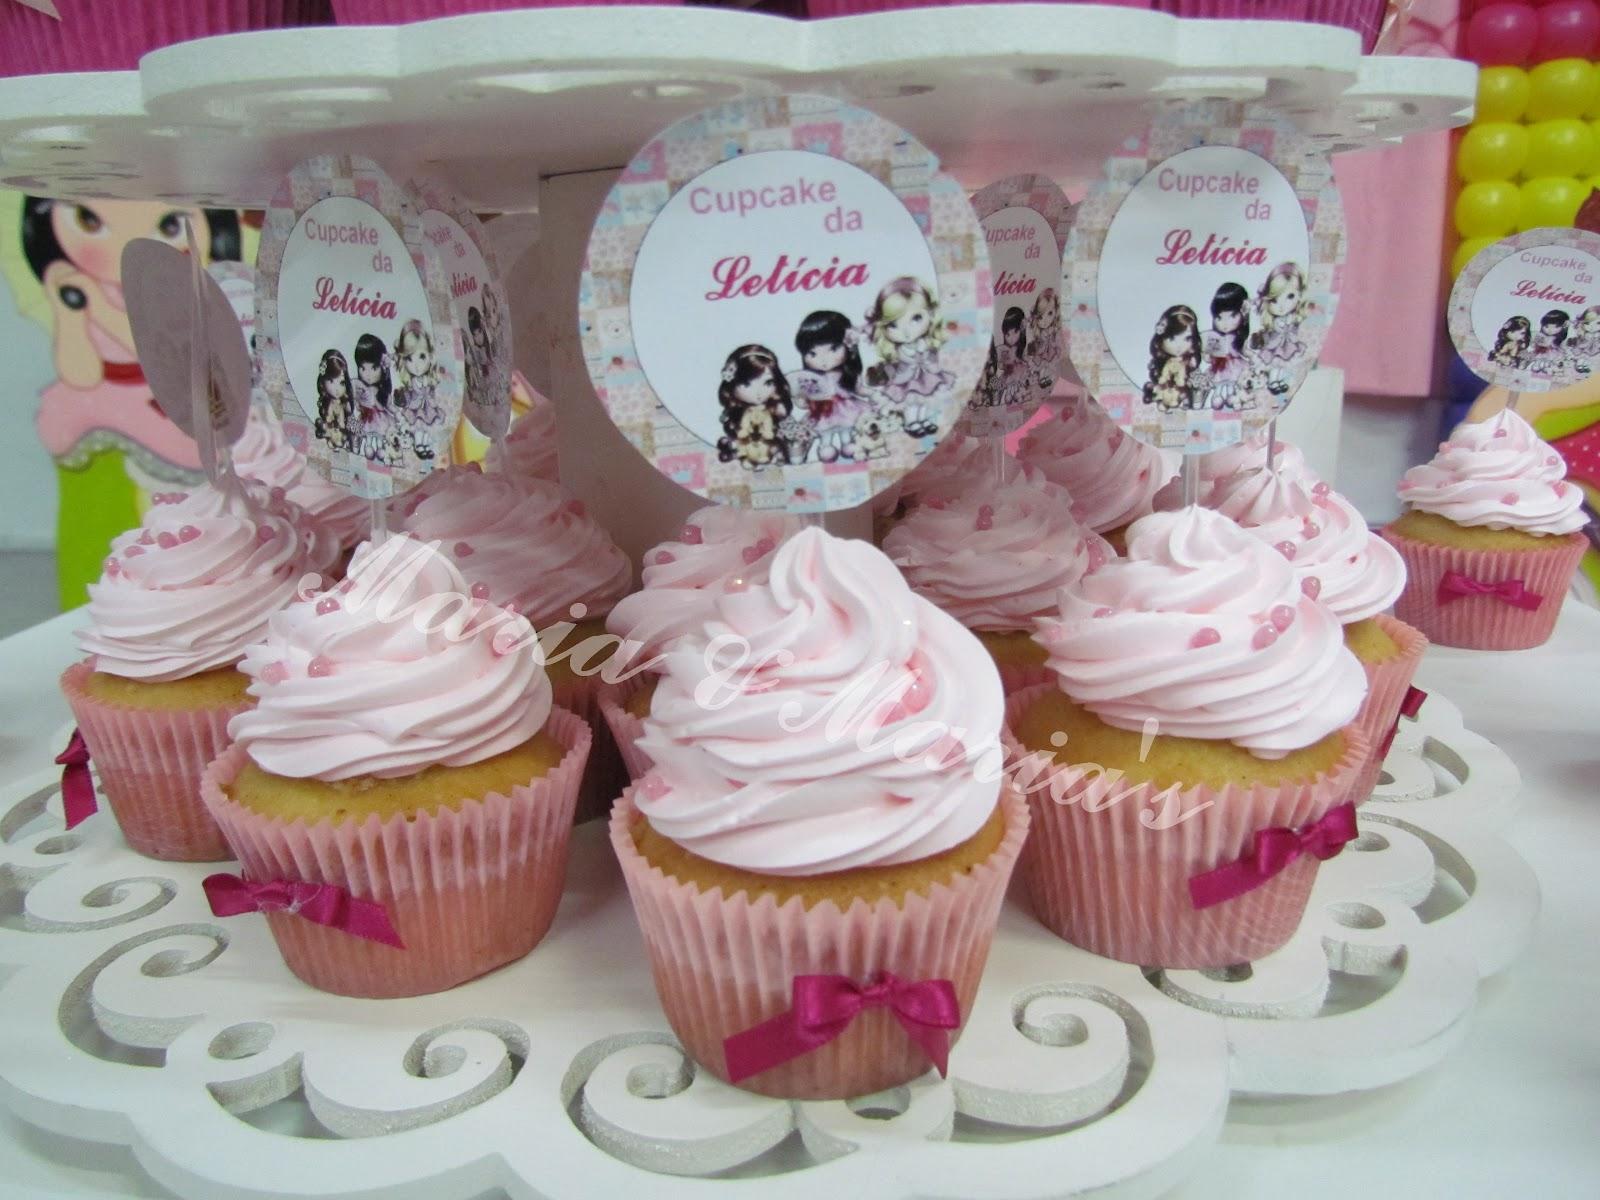 Cupcakes maria maria 39 s cupcake jolie - Jolie cupcake ...